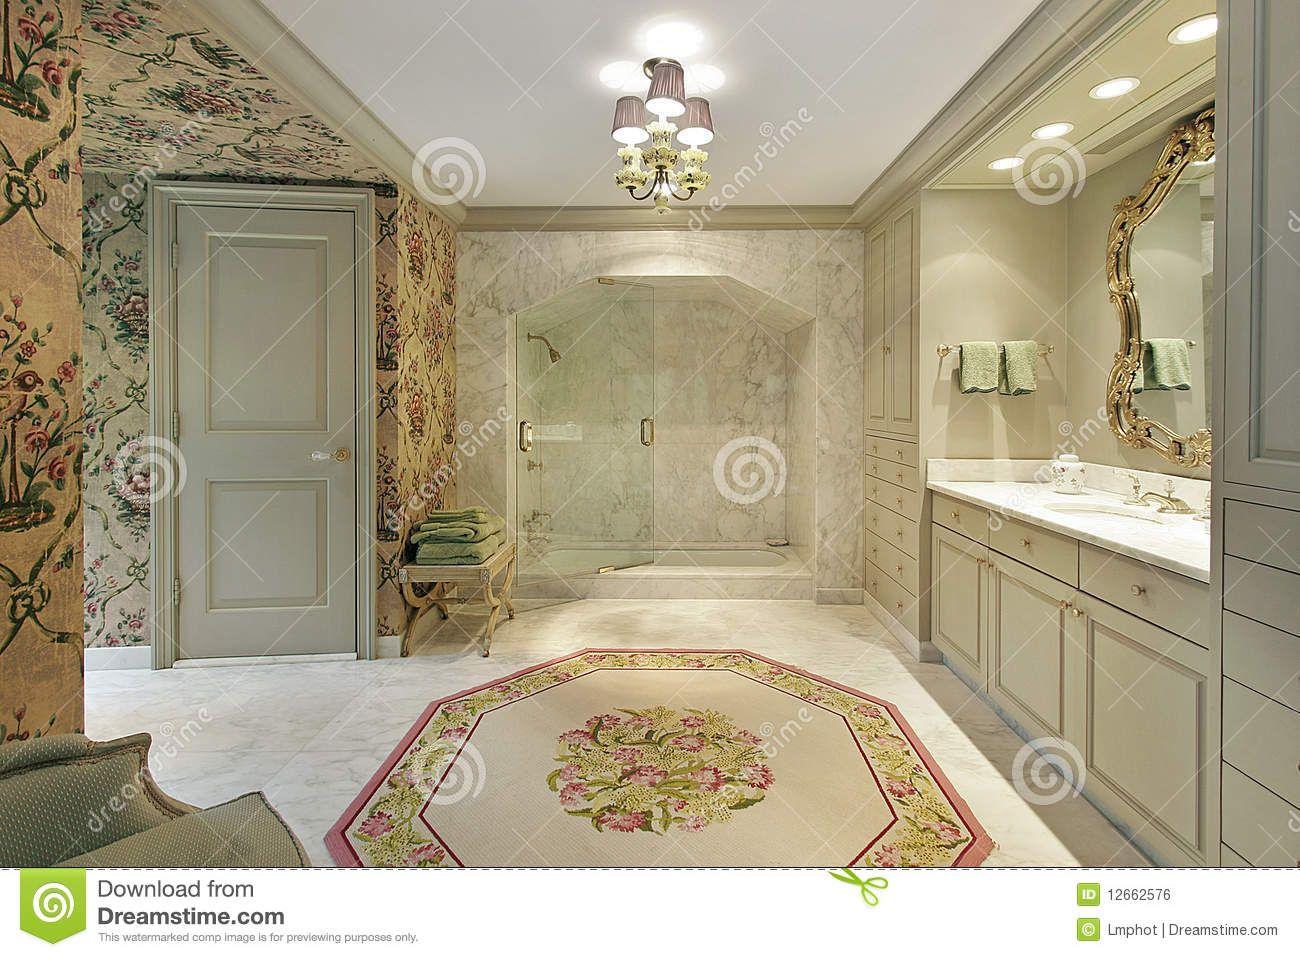 Pin On Bathroom Upscale master bathrooms upscale